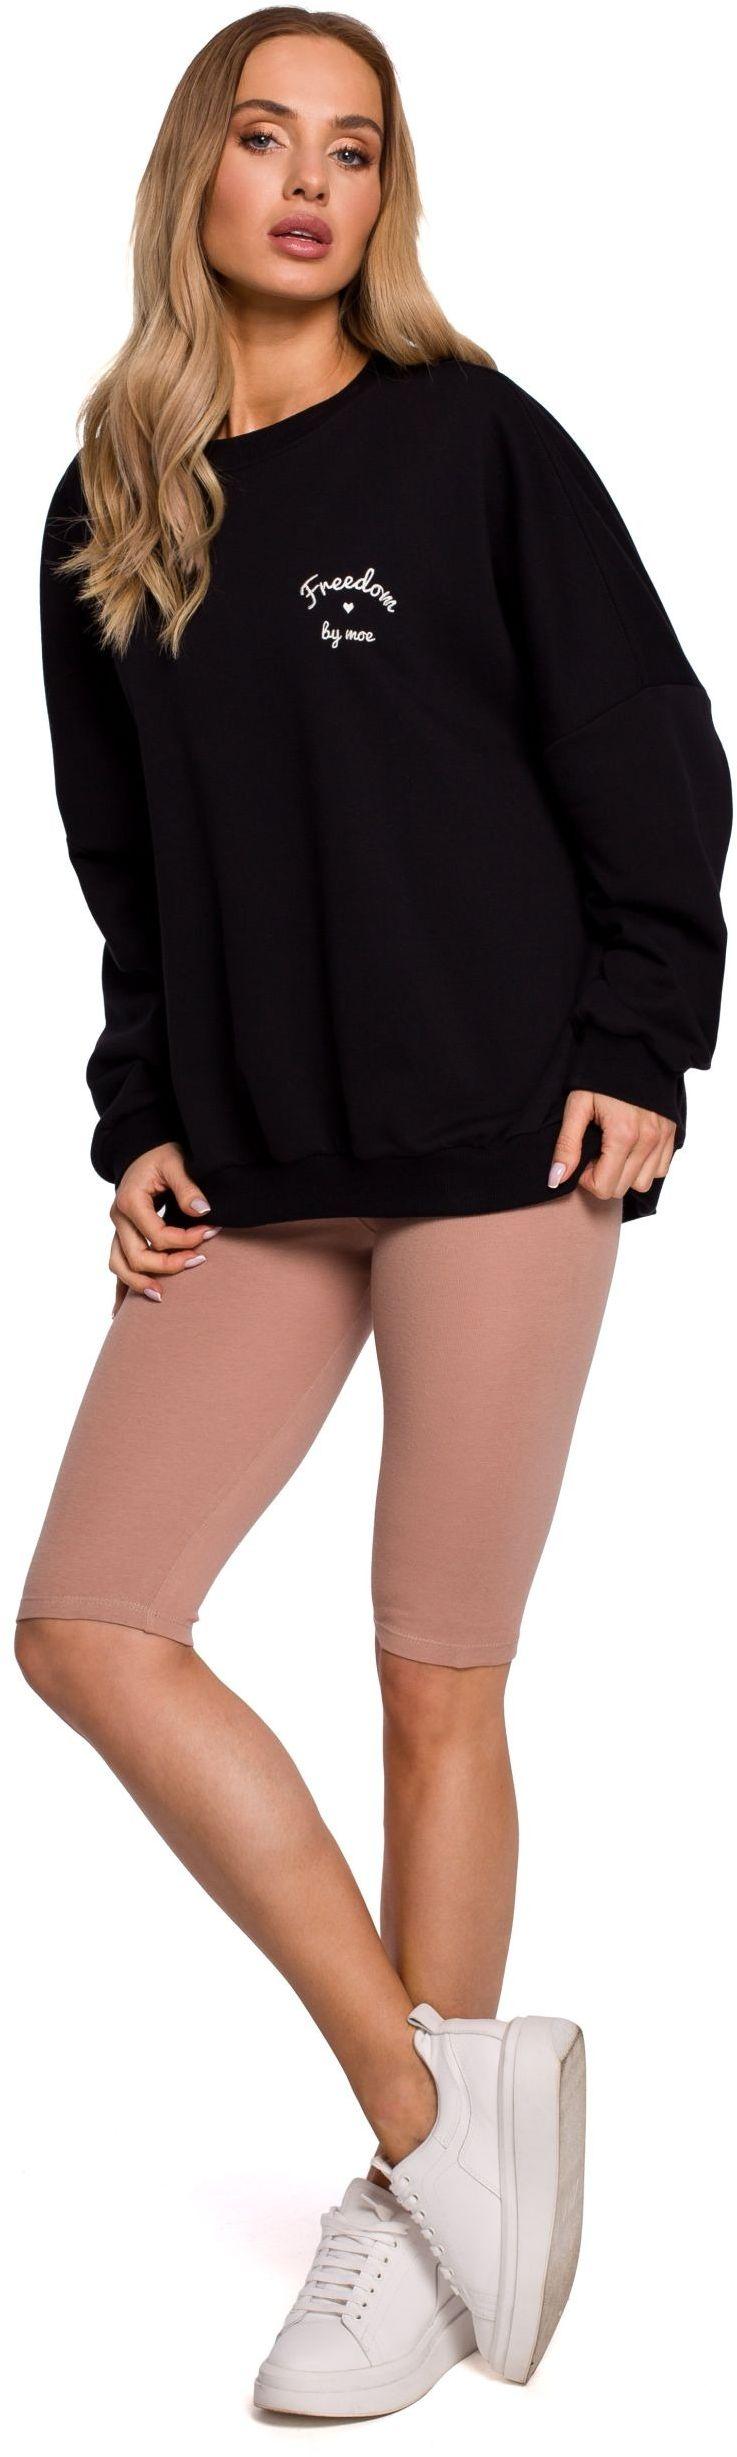 Bawełniane legginsy typu kolarki - mocca